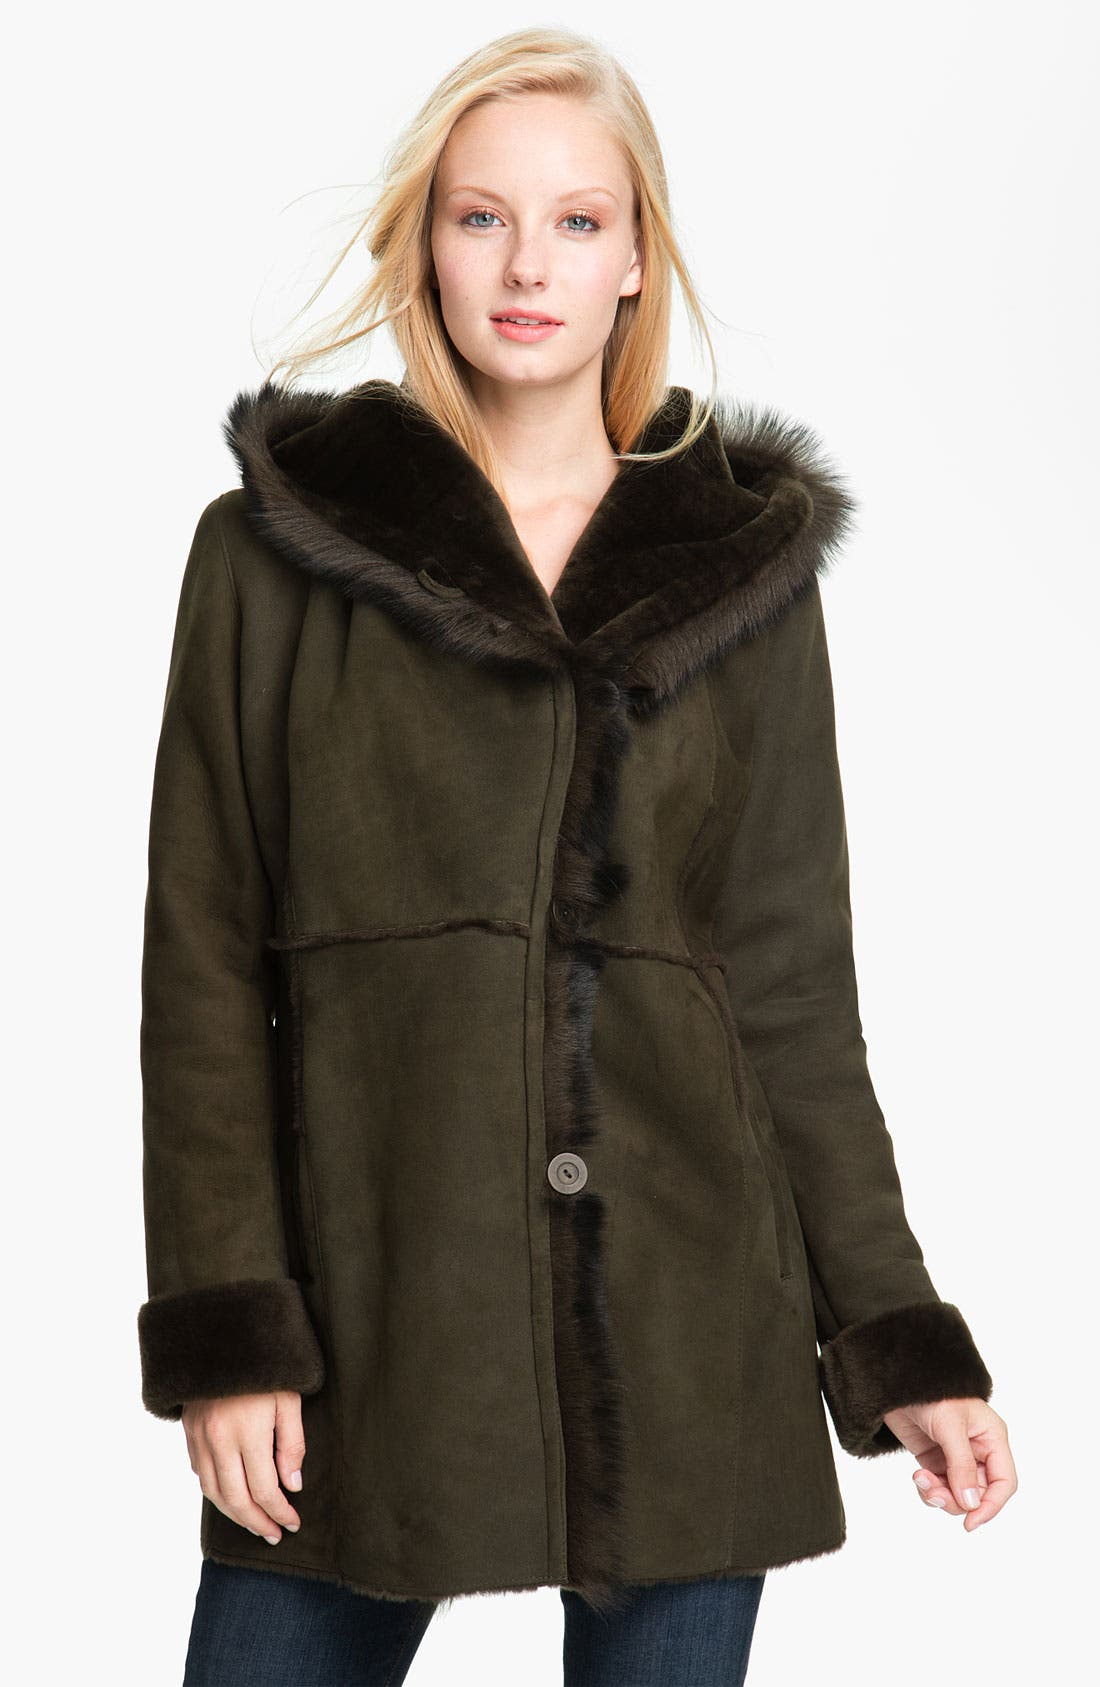 Main Image - Blue Duck Genuine Shearling Hooded Jacket